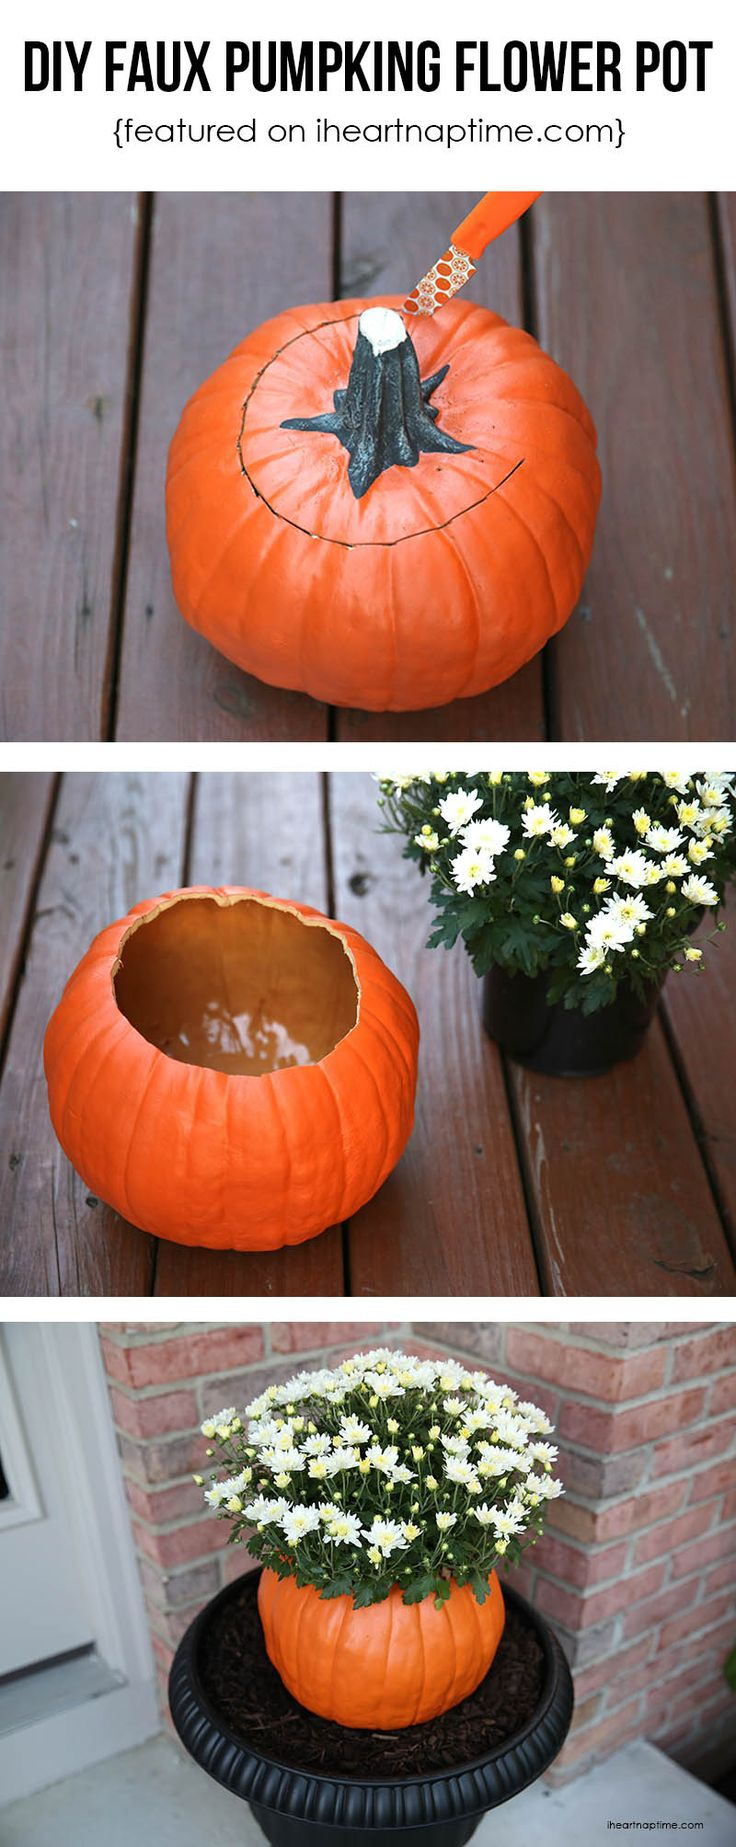 No more squishy pumpkins by Halloween- DIY faux pumpkin flower pot tutorial via I Heart Naptime